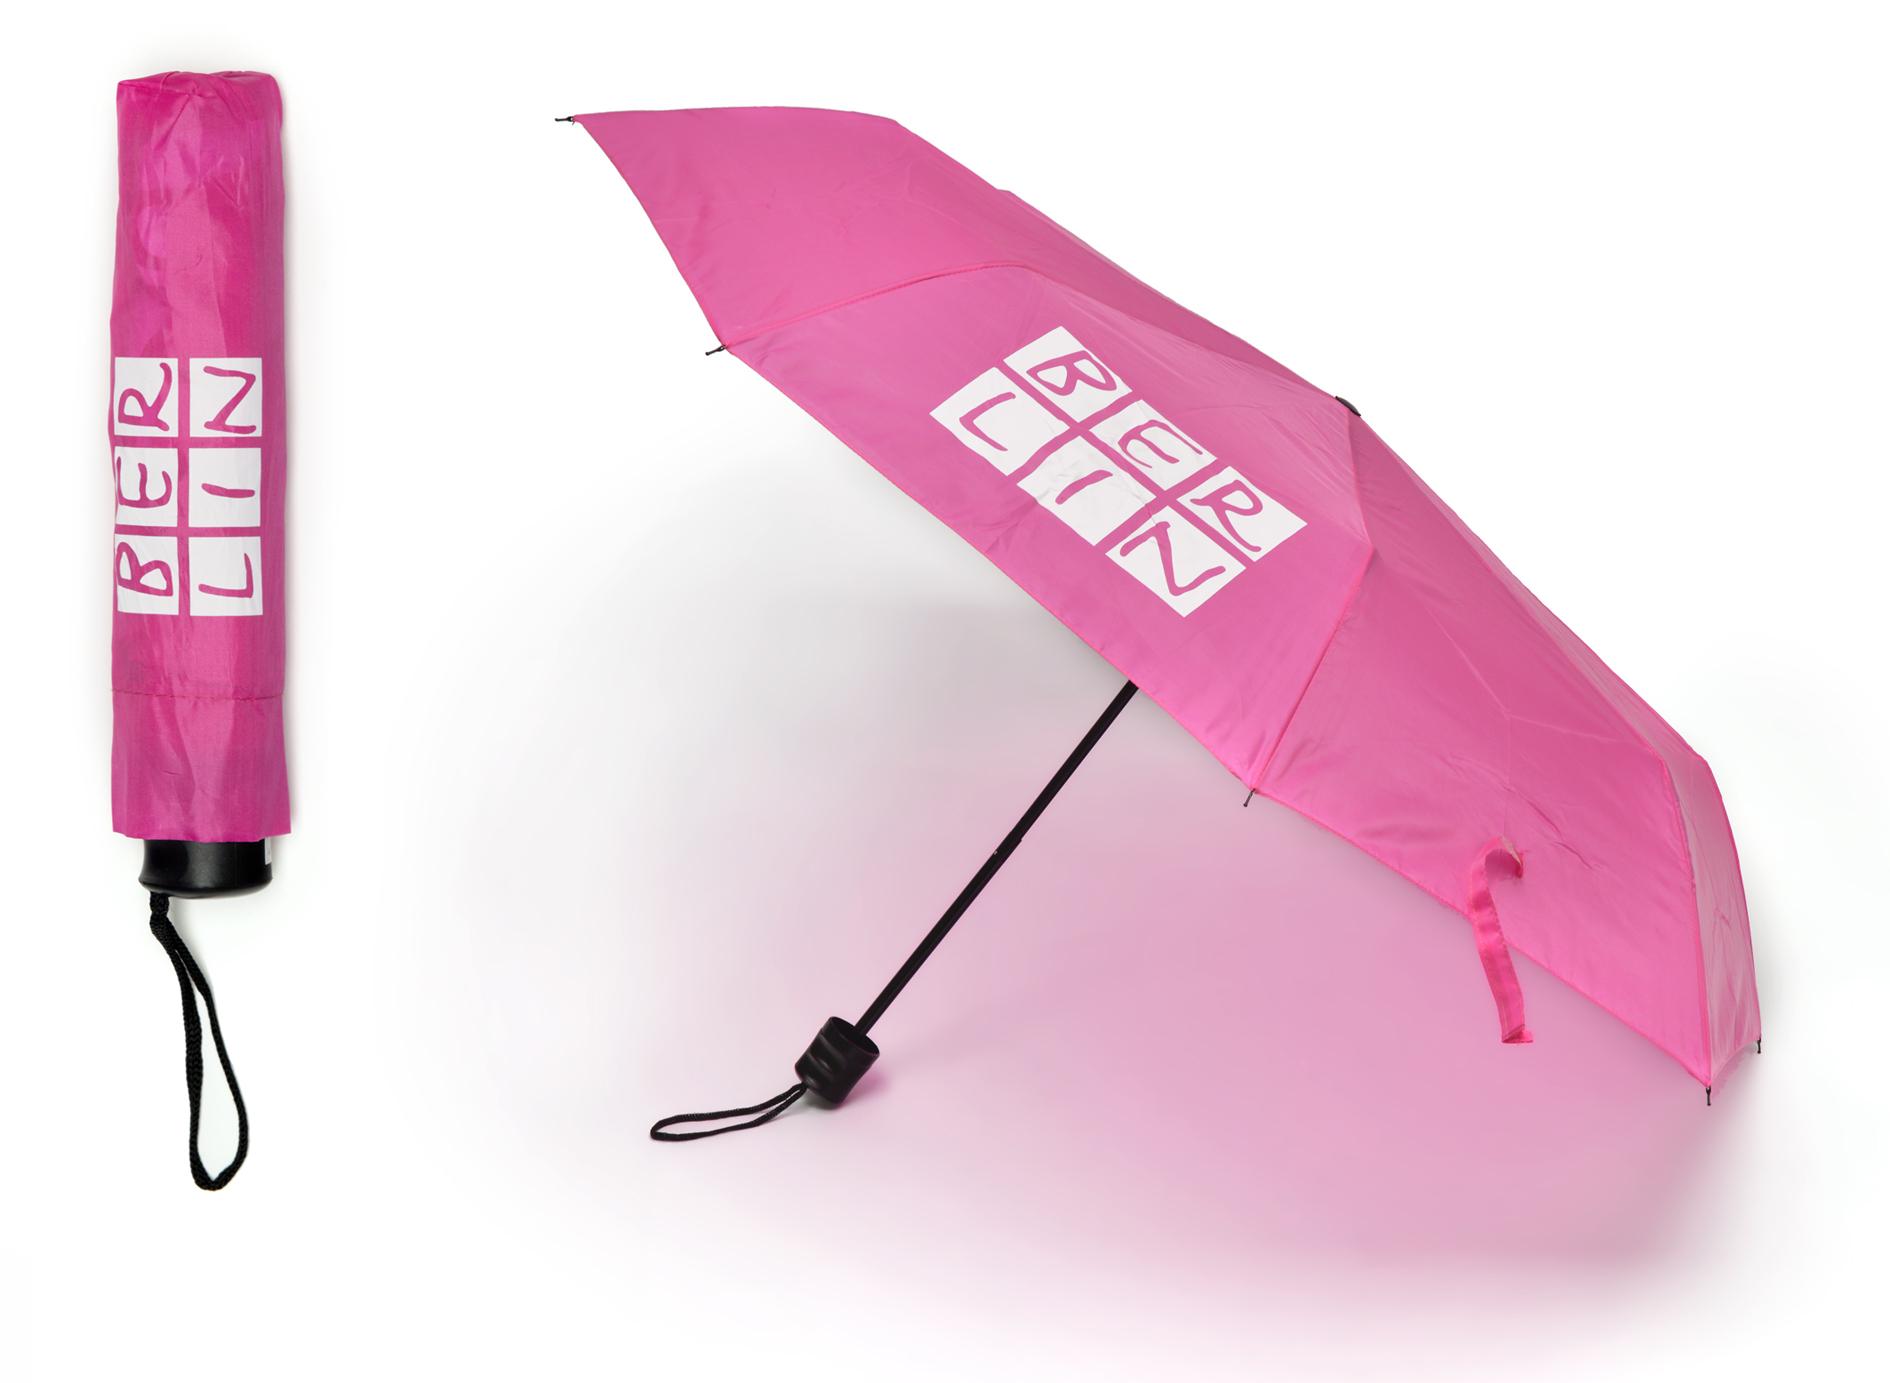 Faltregenschirm BERLIN rosa-weiß